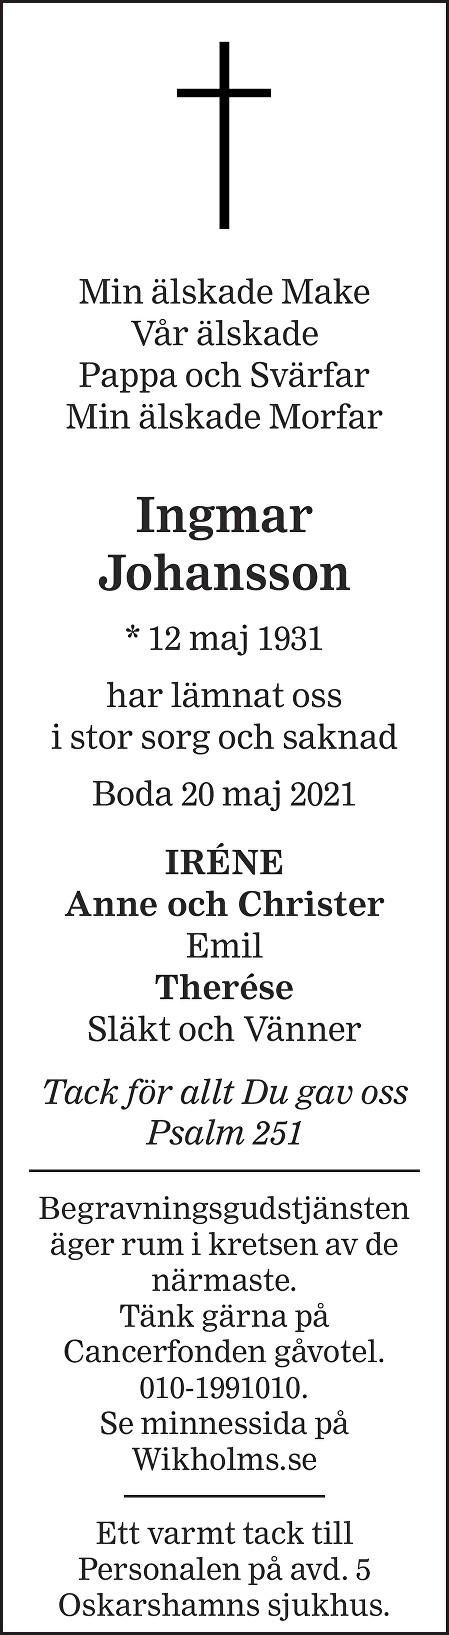 Ingmar Johansson Death notice